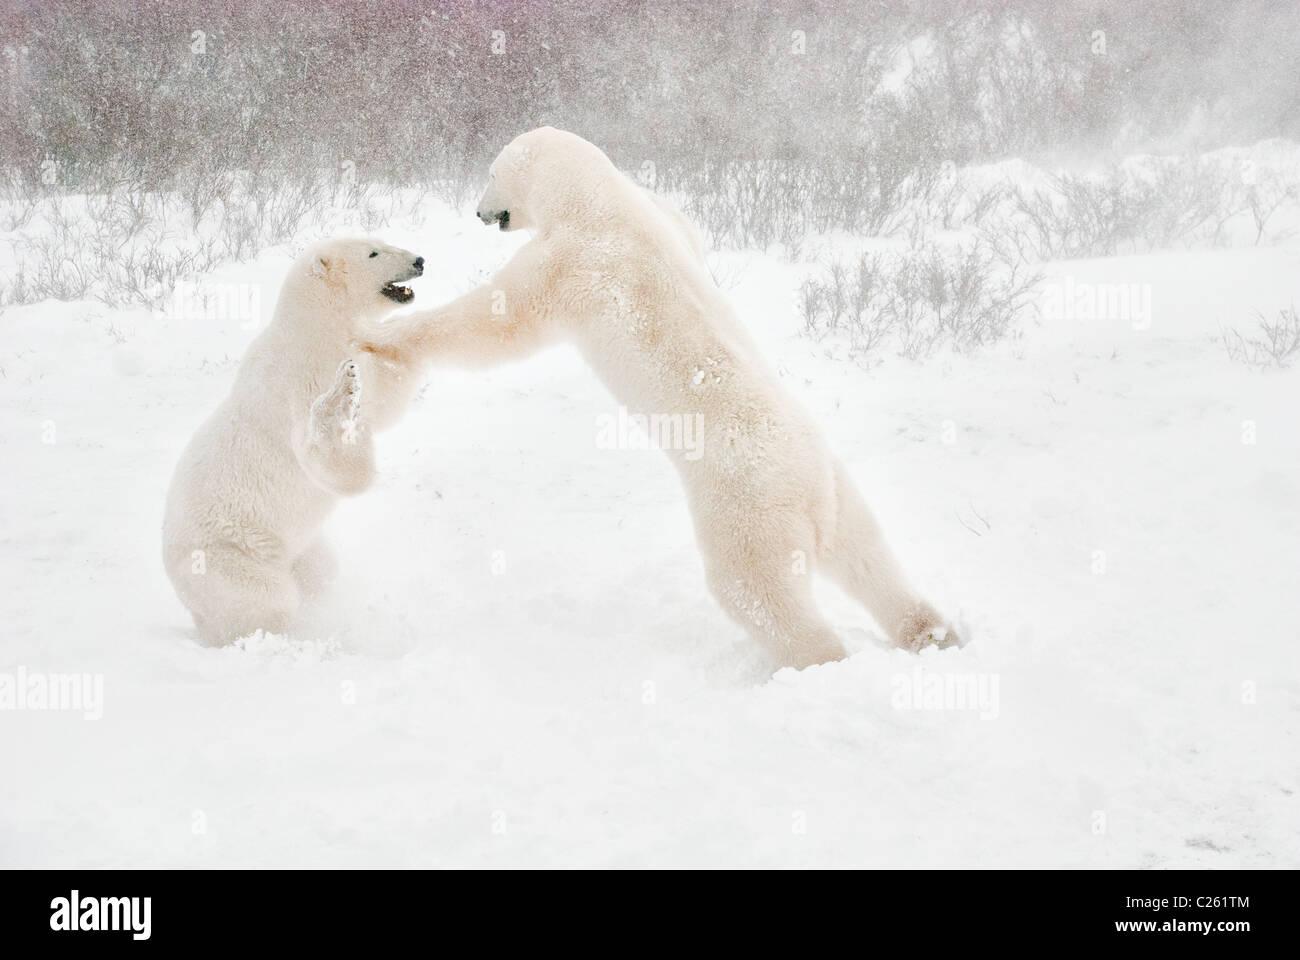 Polar Bears, Ursus maritimus, play fighting, Wapusk National Park, near Hudson Bay, Cape Churchill, Manitoba, Canada - Stock Image